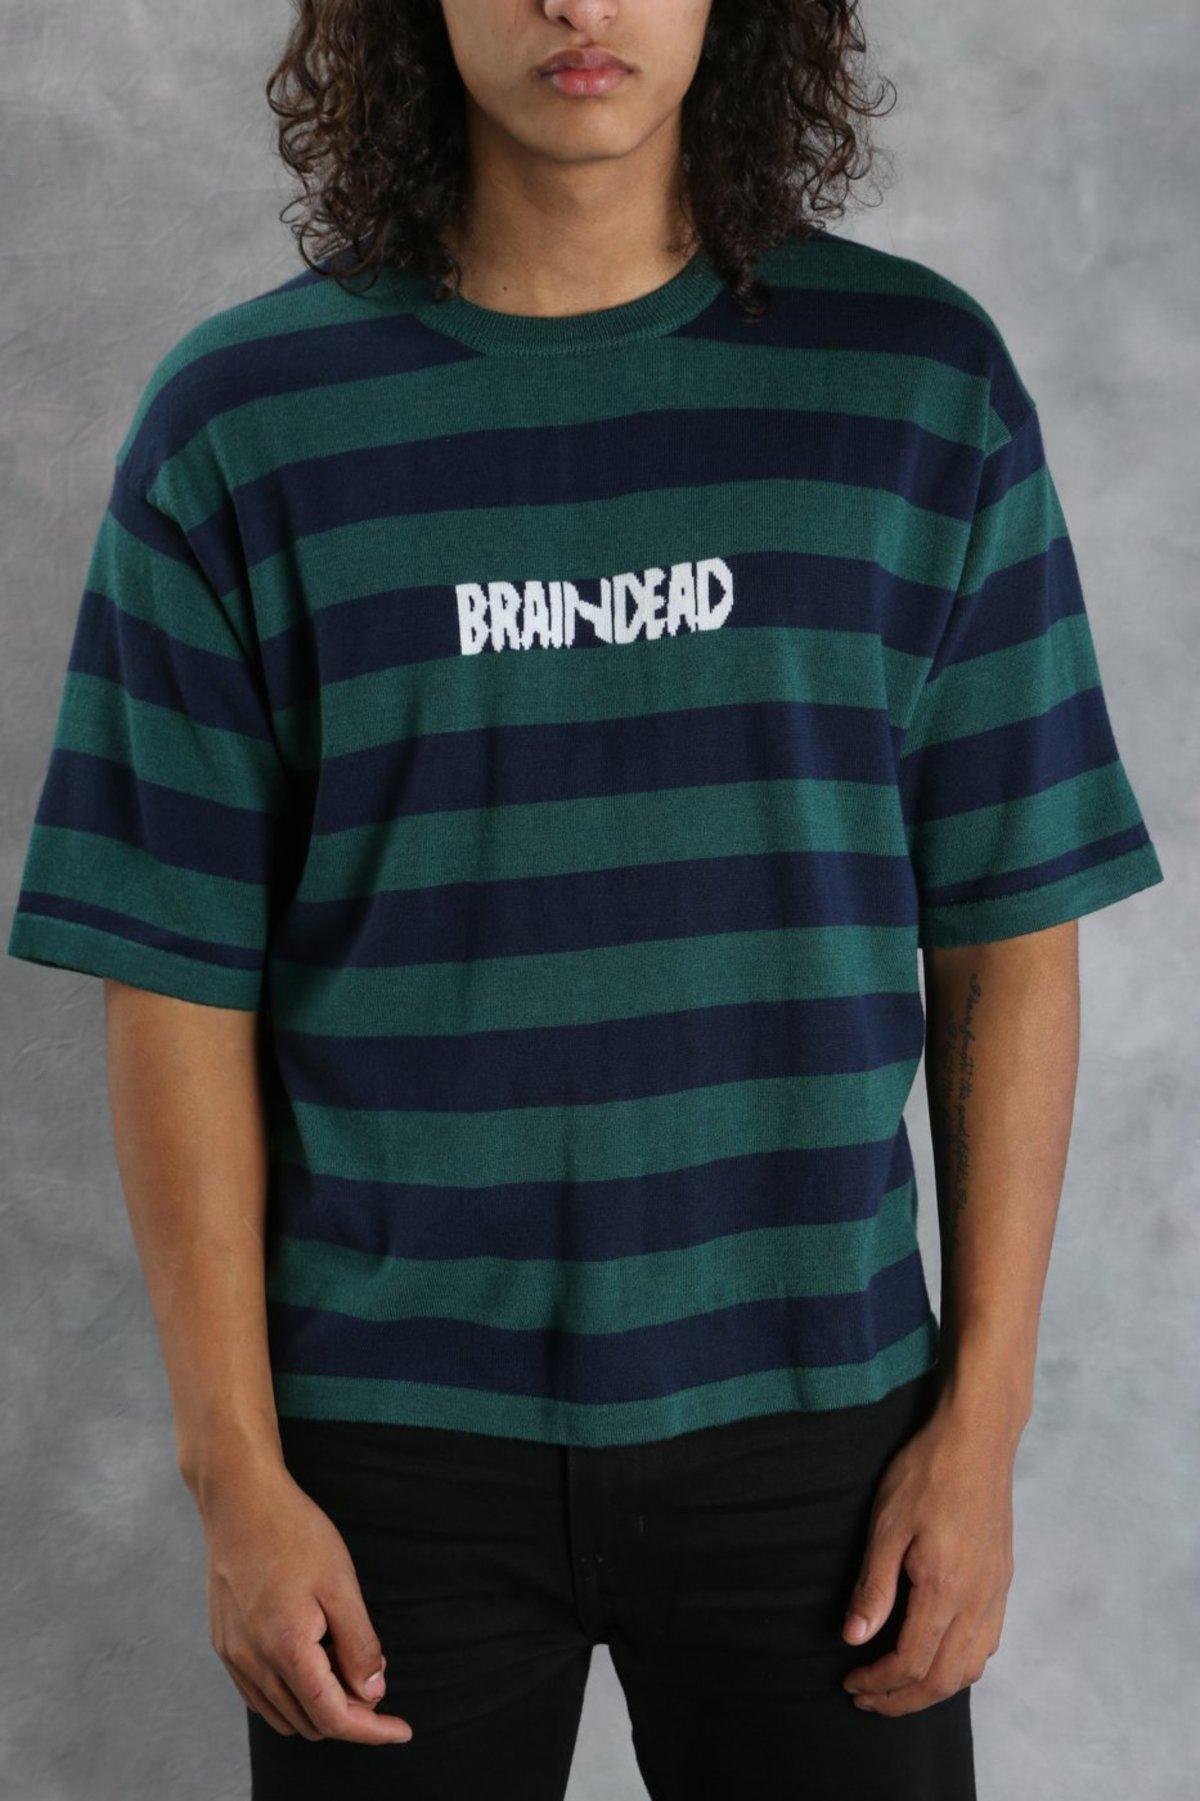 Brain Dead Striped Angora Sweater T Shirt Green Navy Garmentory